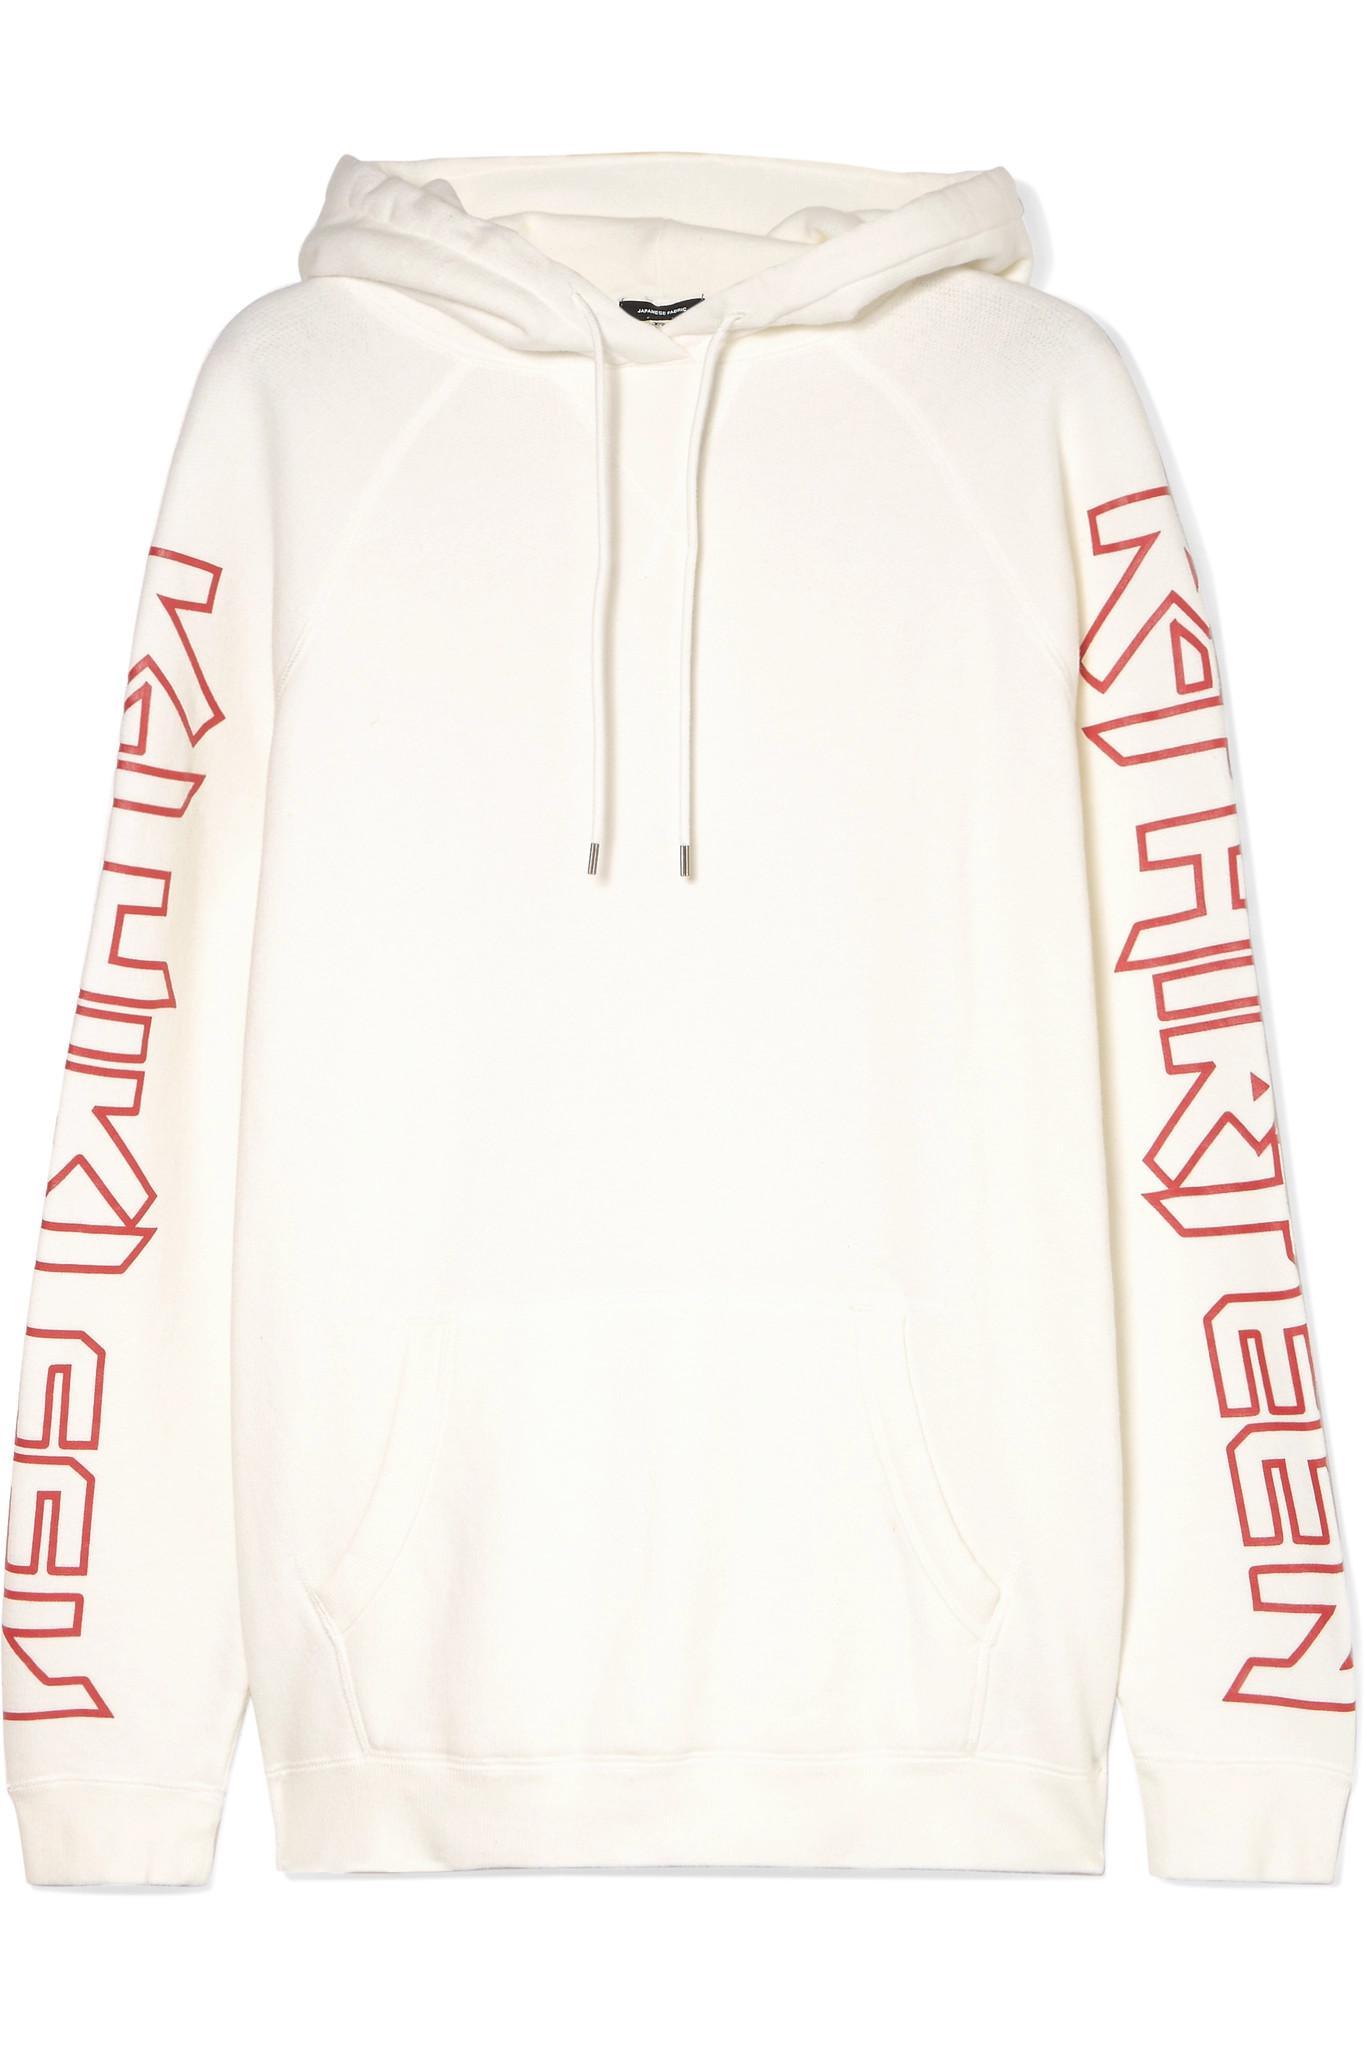 0b54f17a4325 r13-white-R-Thirteen-Printed-Cotton-blend-Jersey-Hooded-Top.jpeg